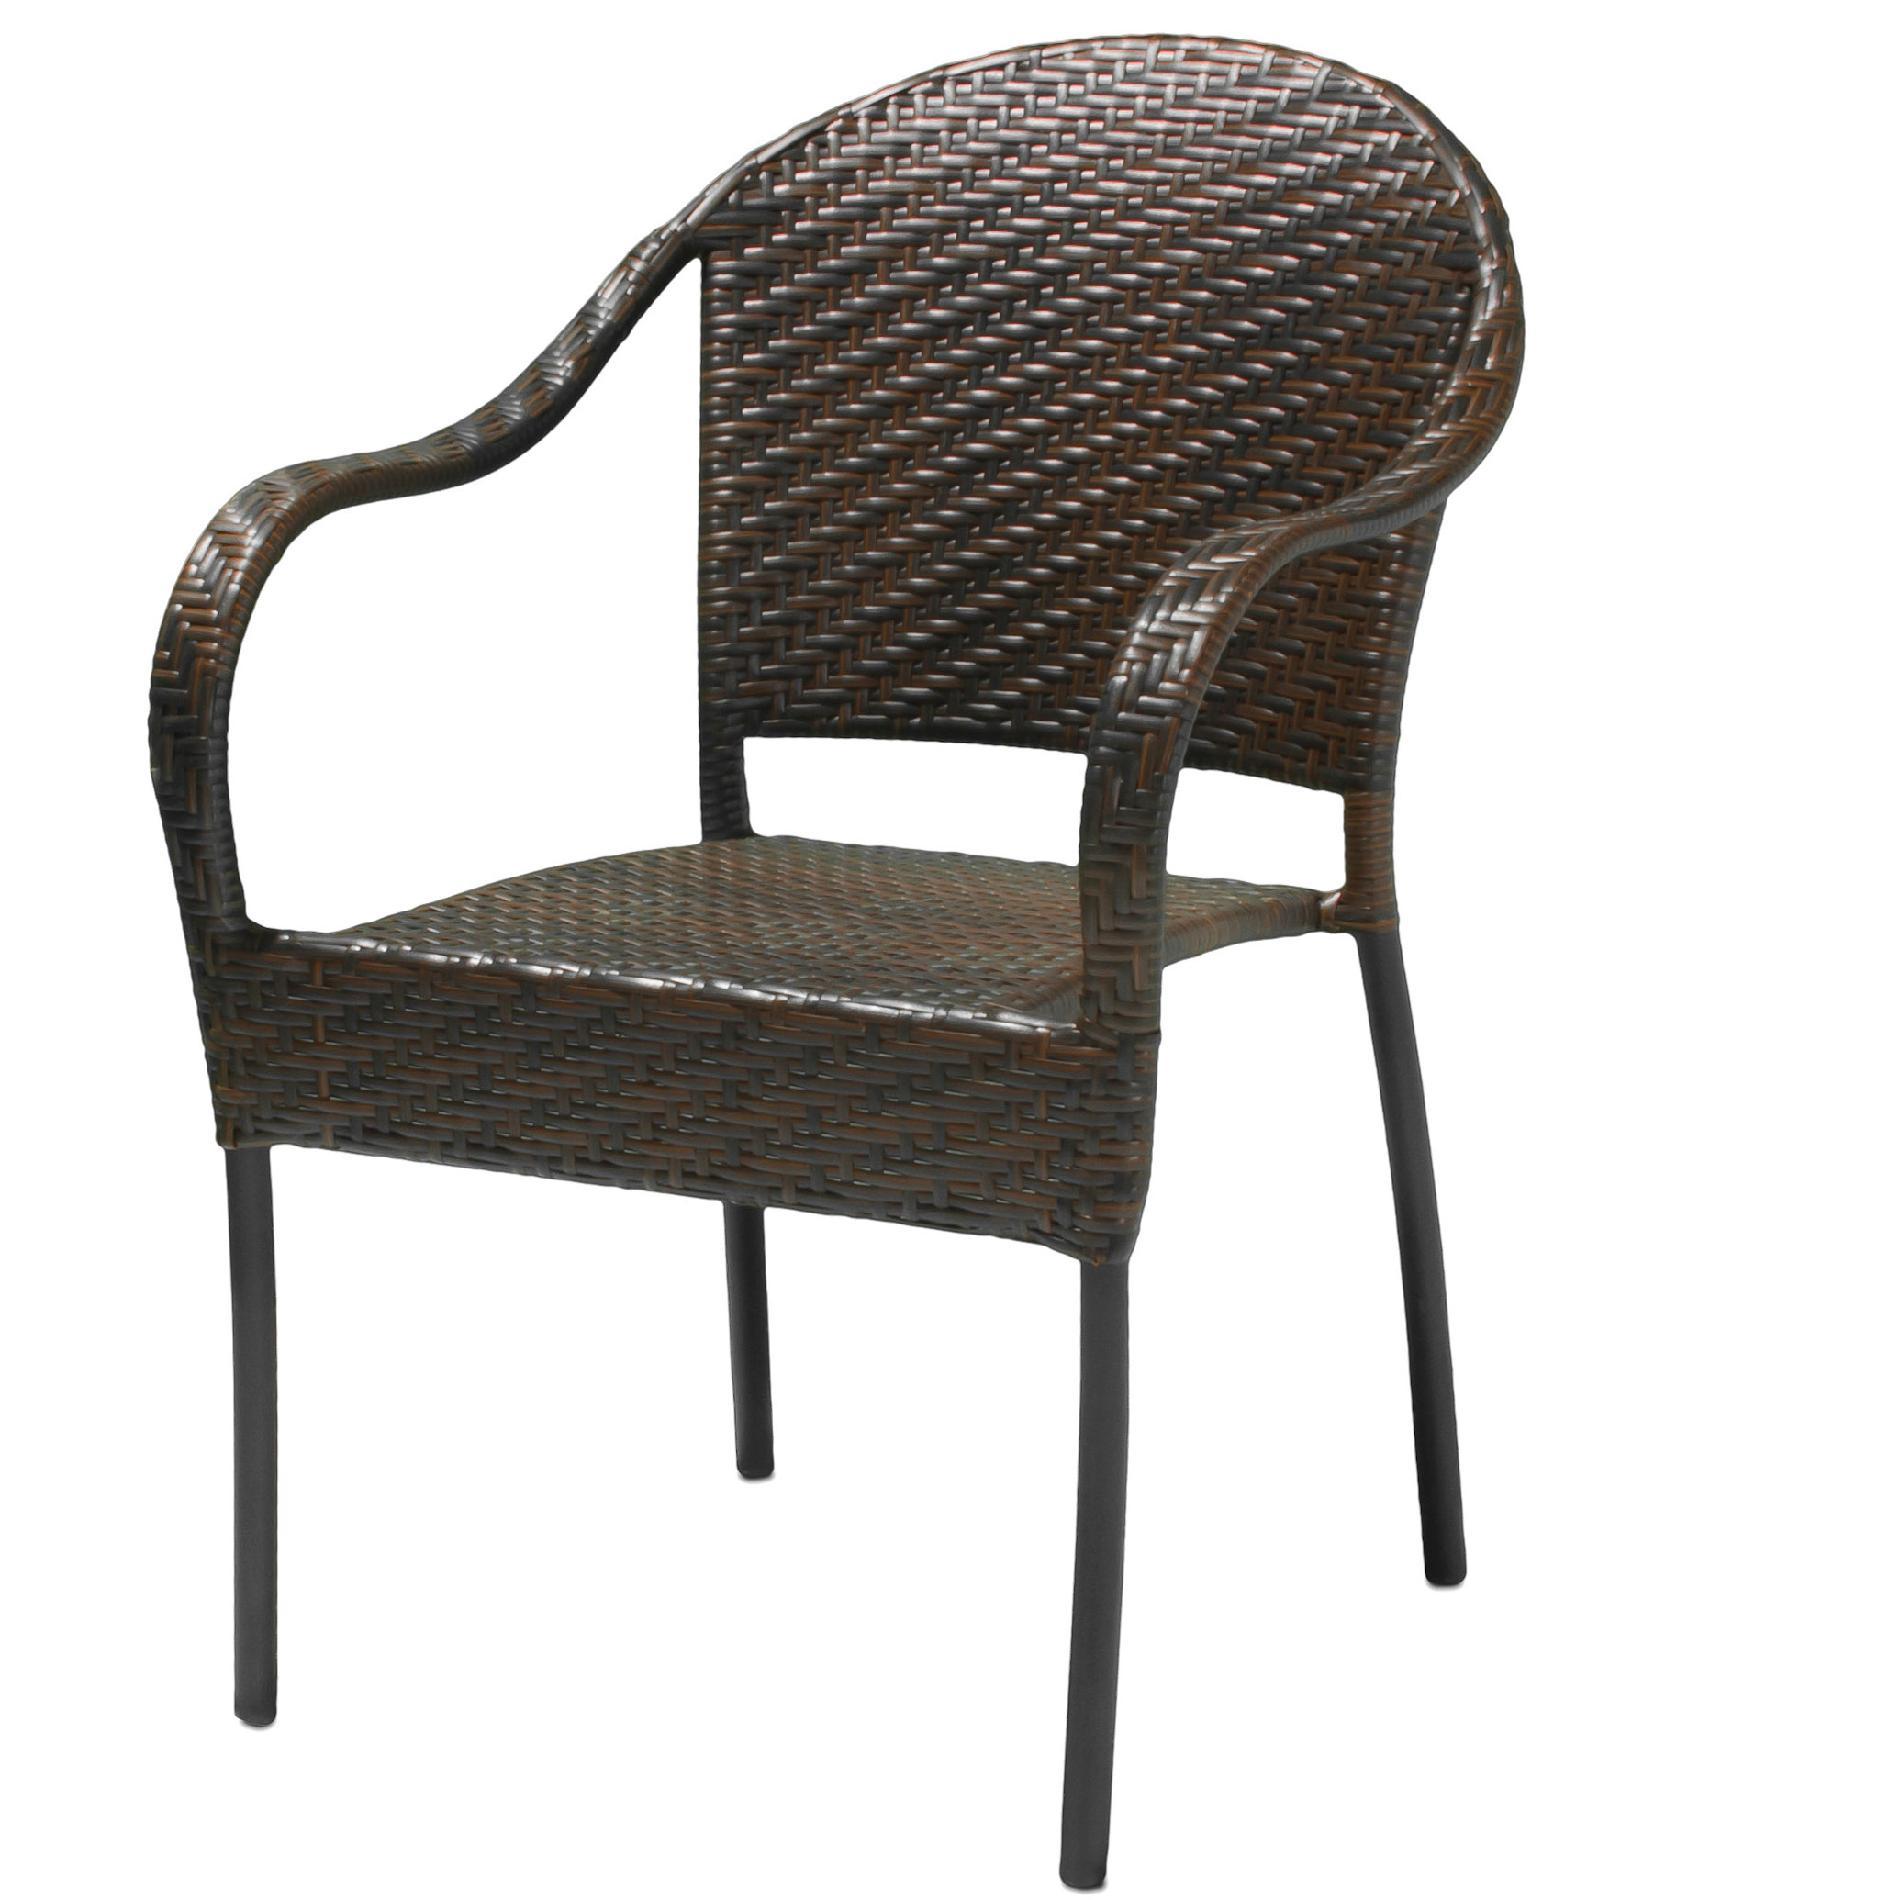 Kmart Outdoor Furniture Wicker Chairs